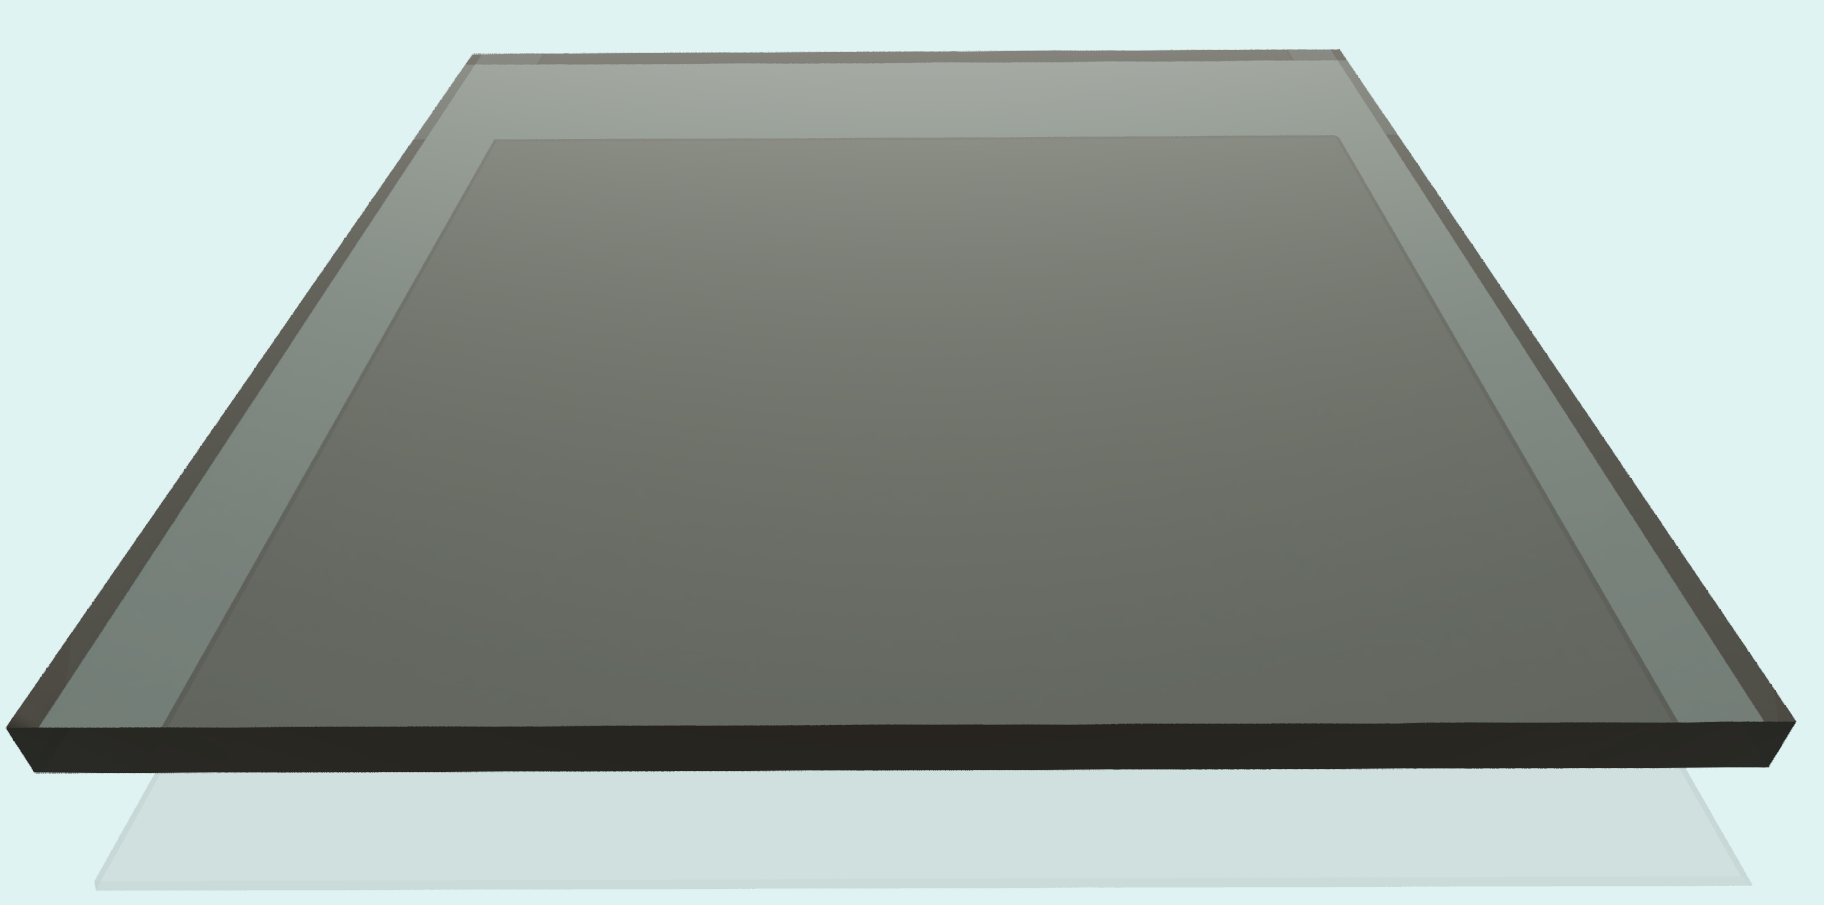 Polycarbonat 6 mm, rauchfarben